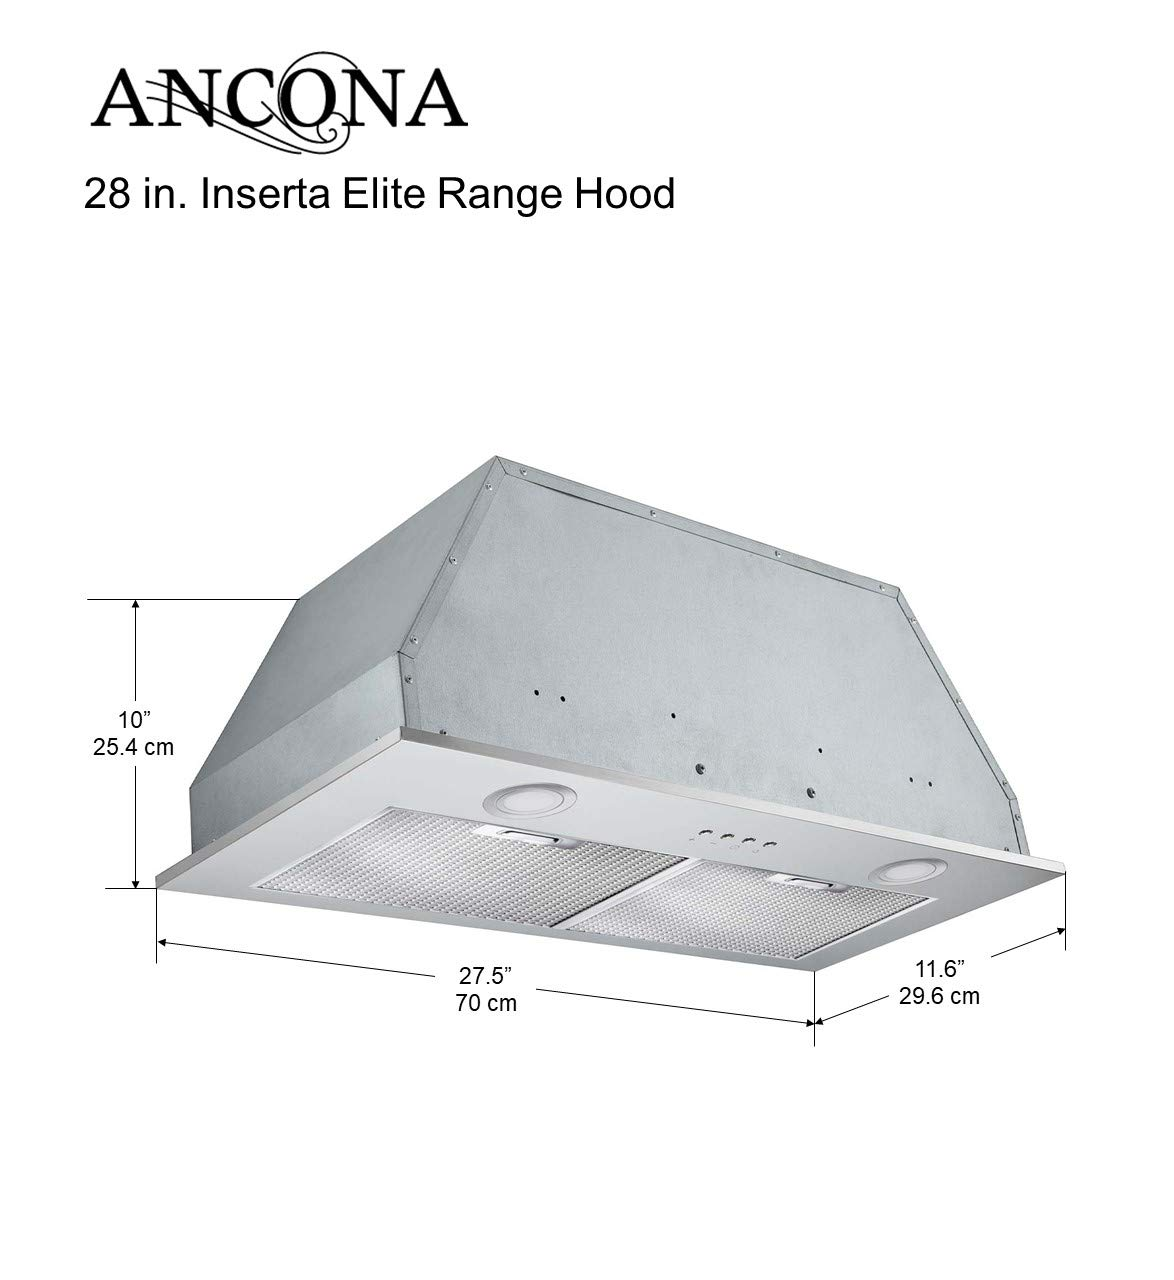 Ancona AN-1307 28 in Inserta Elite 630 CFM Ducted Insert Range Hood